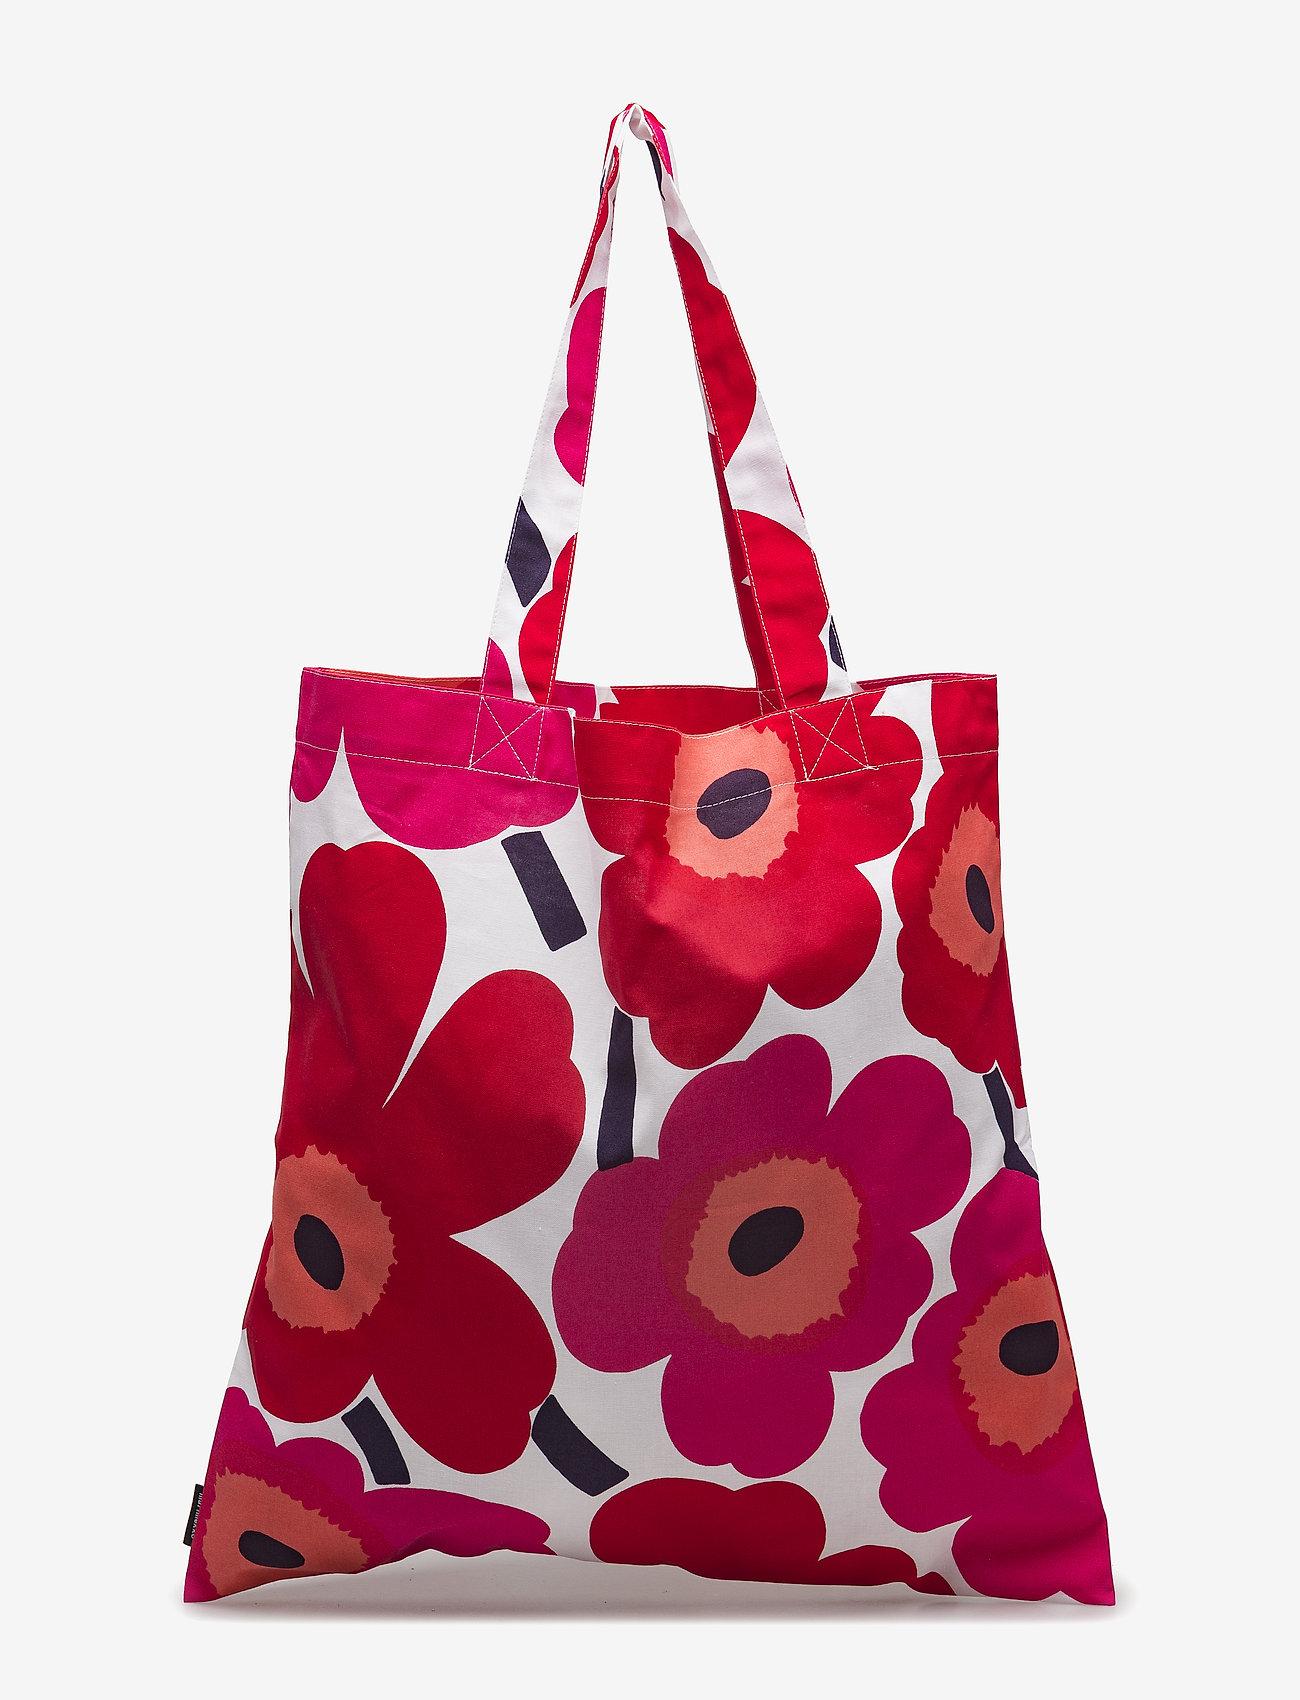 Marimekko Home - PIENI UNIKKO BAG - tote bags - white, red - 0